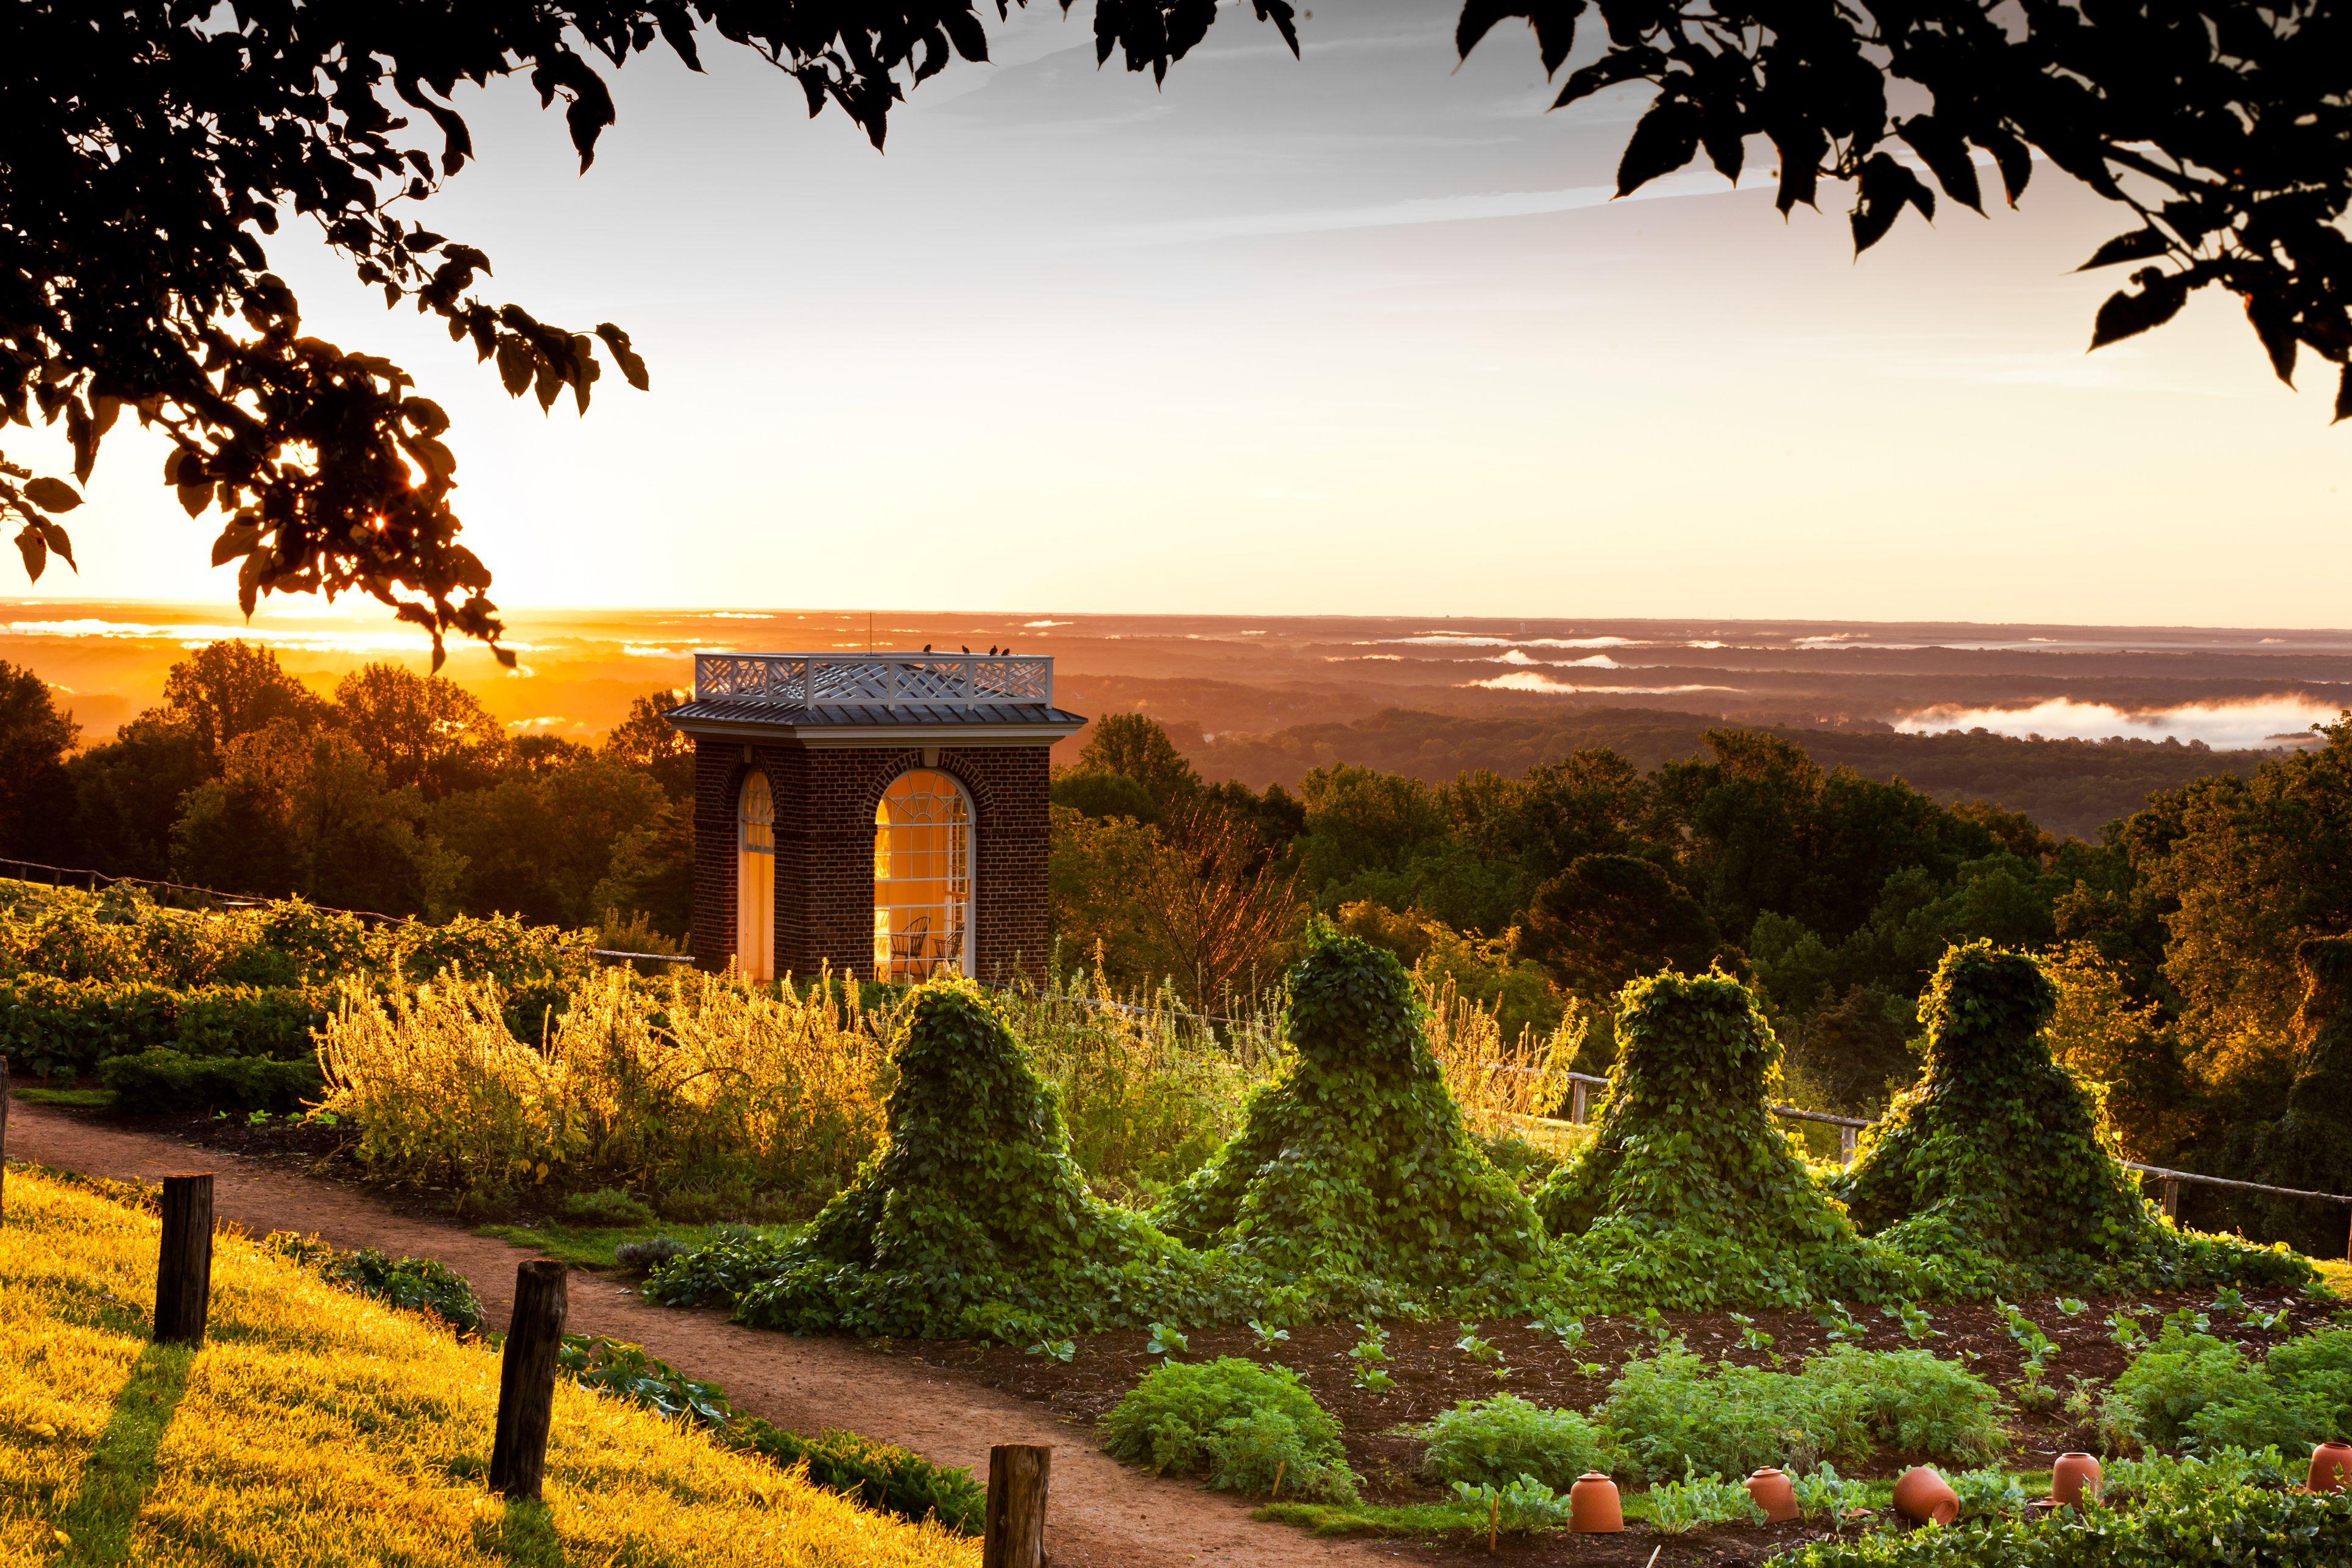 Monticello Garden Terrace Sunset   Gardens   Pinterest   Gardens